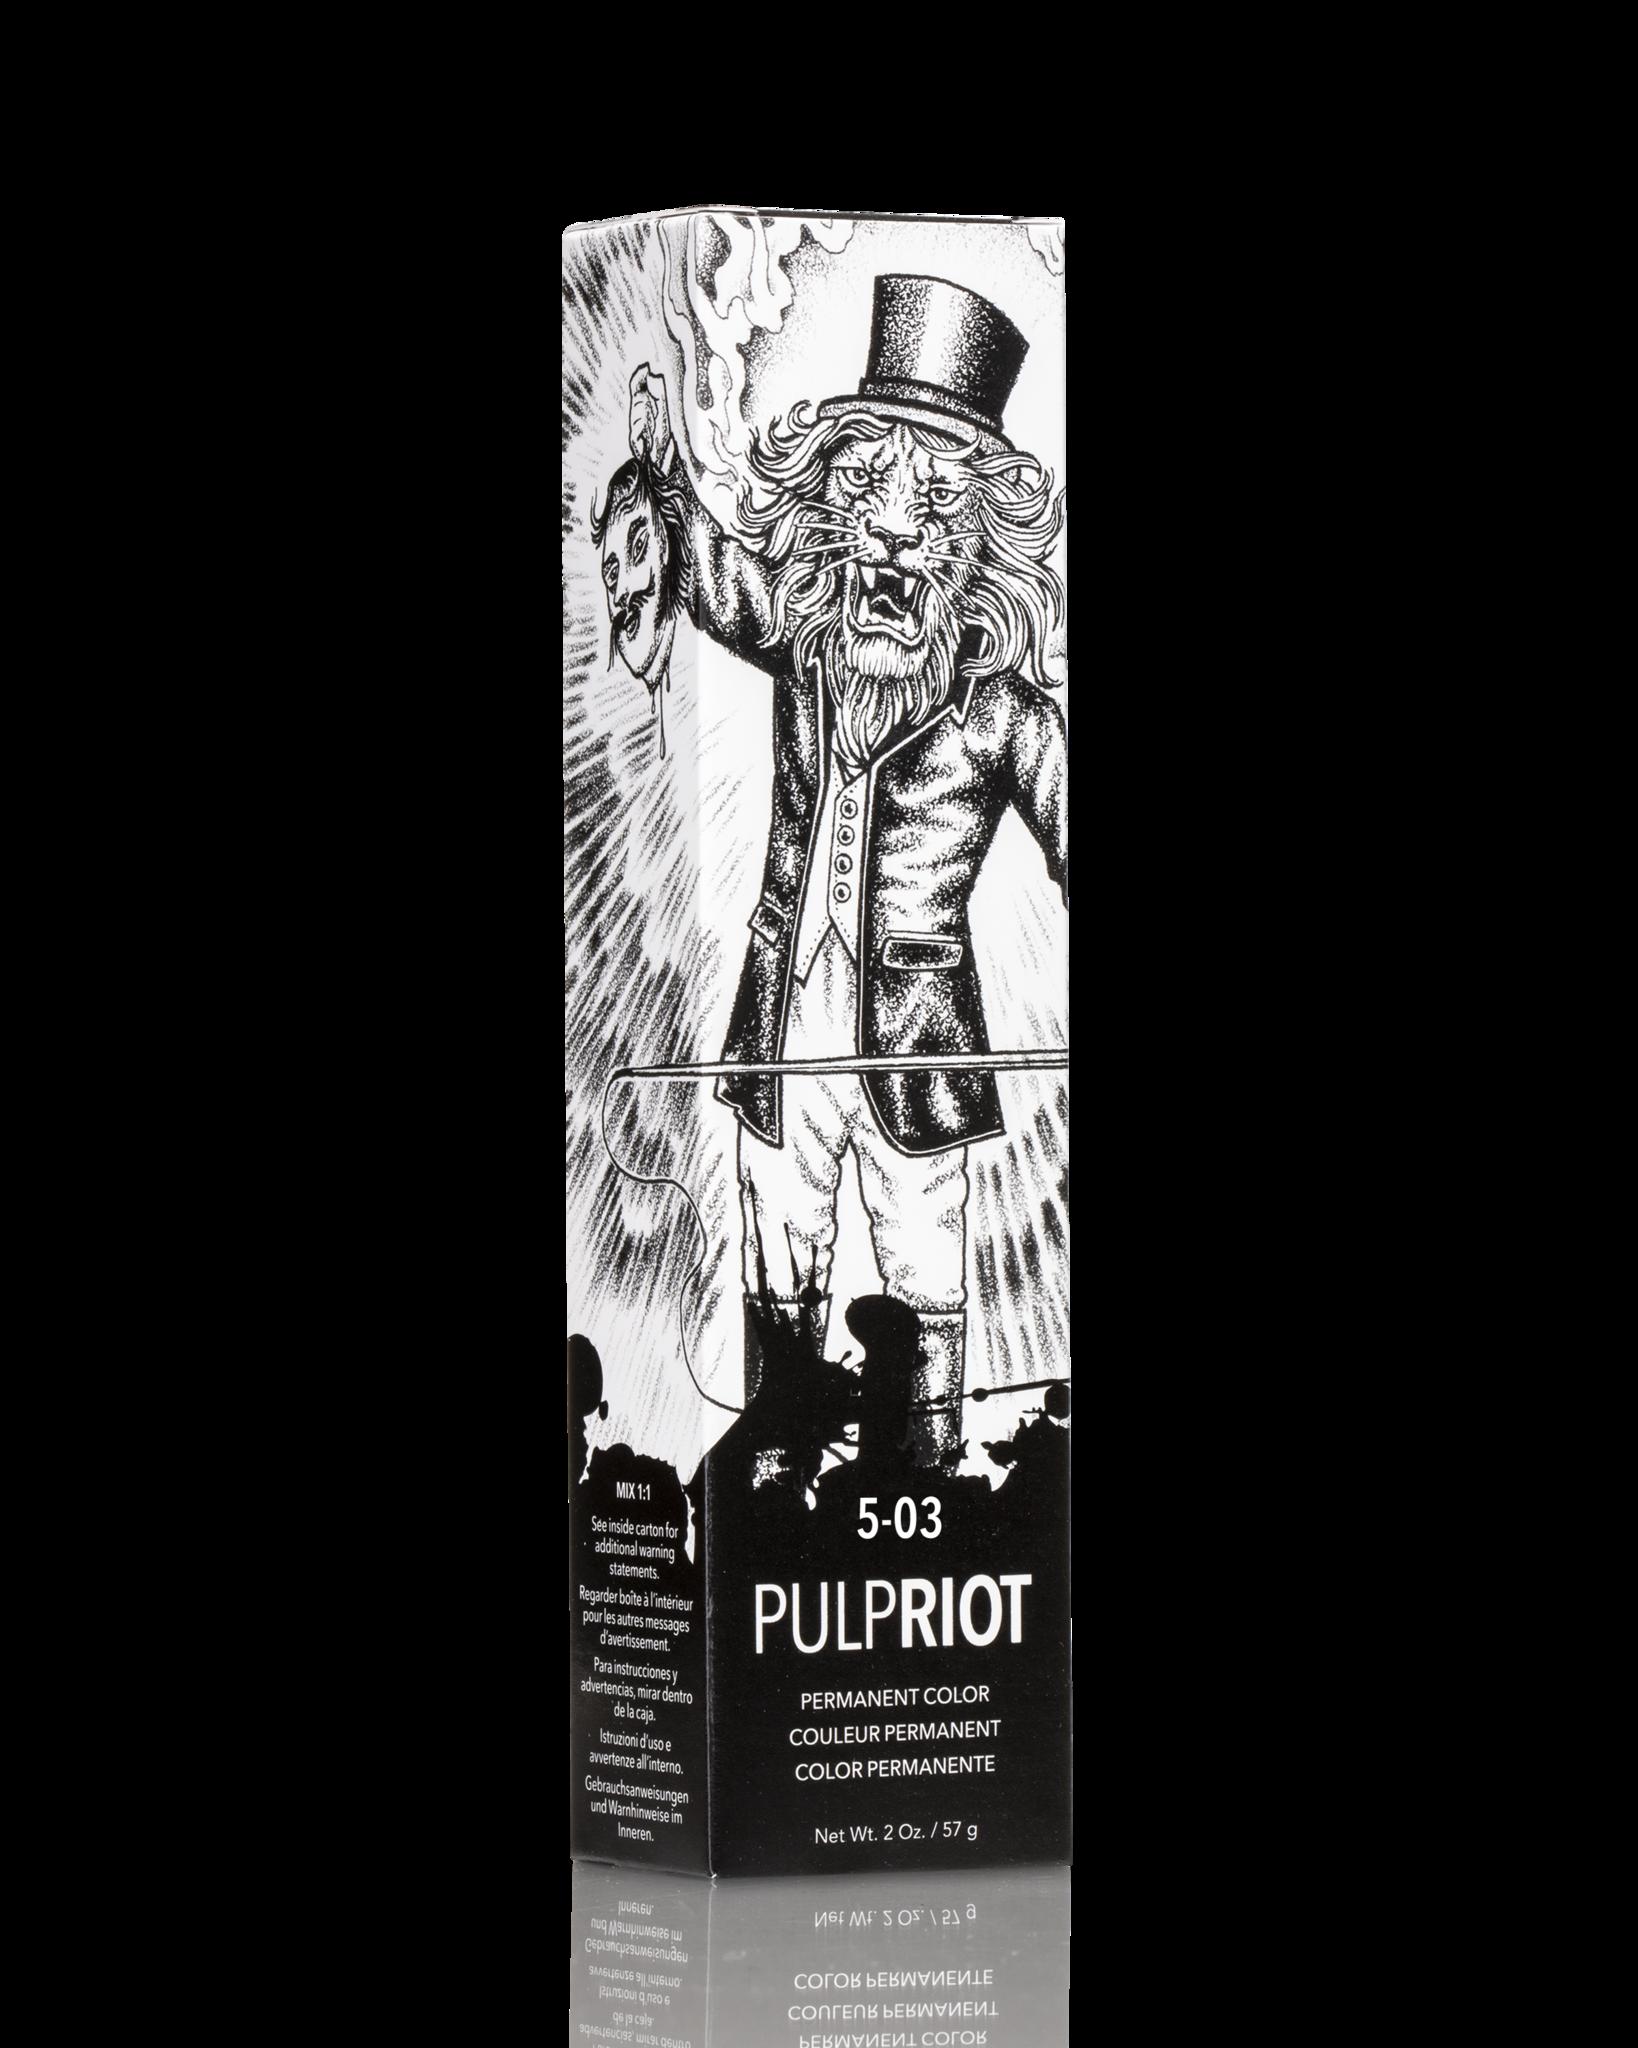 Pulp Riot PULP RIOT FACTION 8 NATUREL DORÉ/NATUREL GOLD 5-03